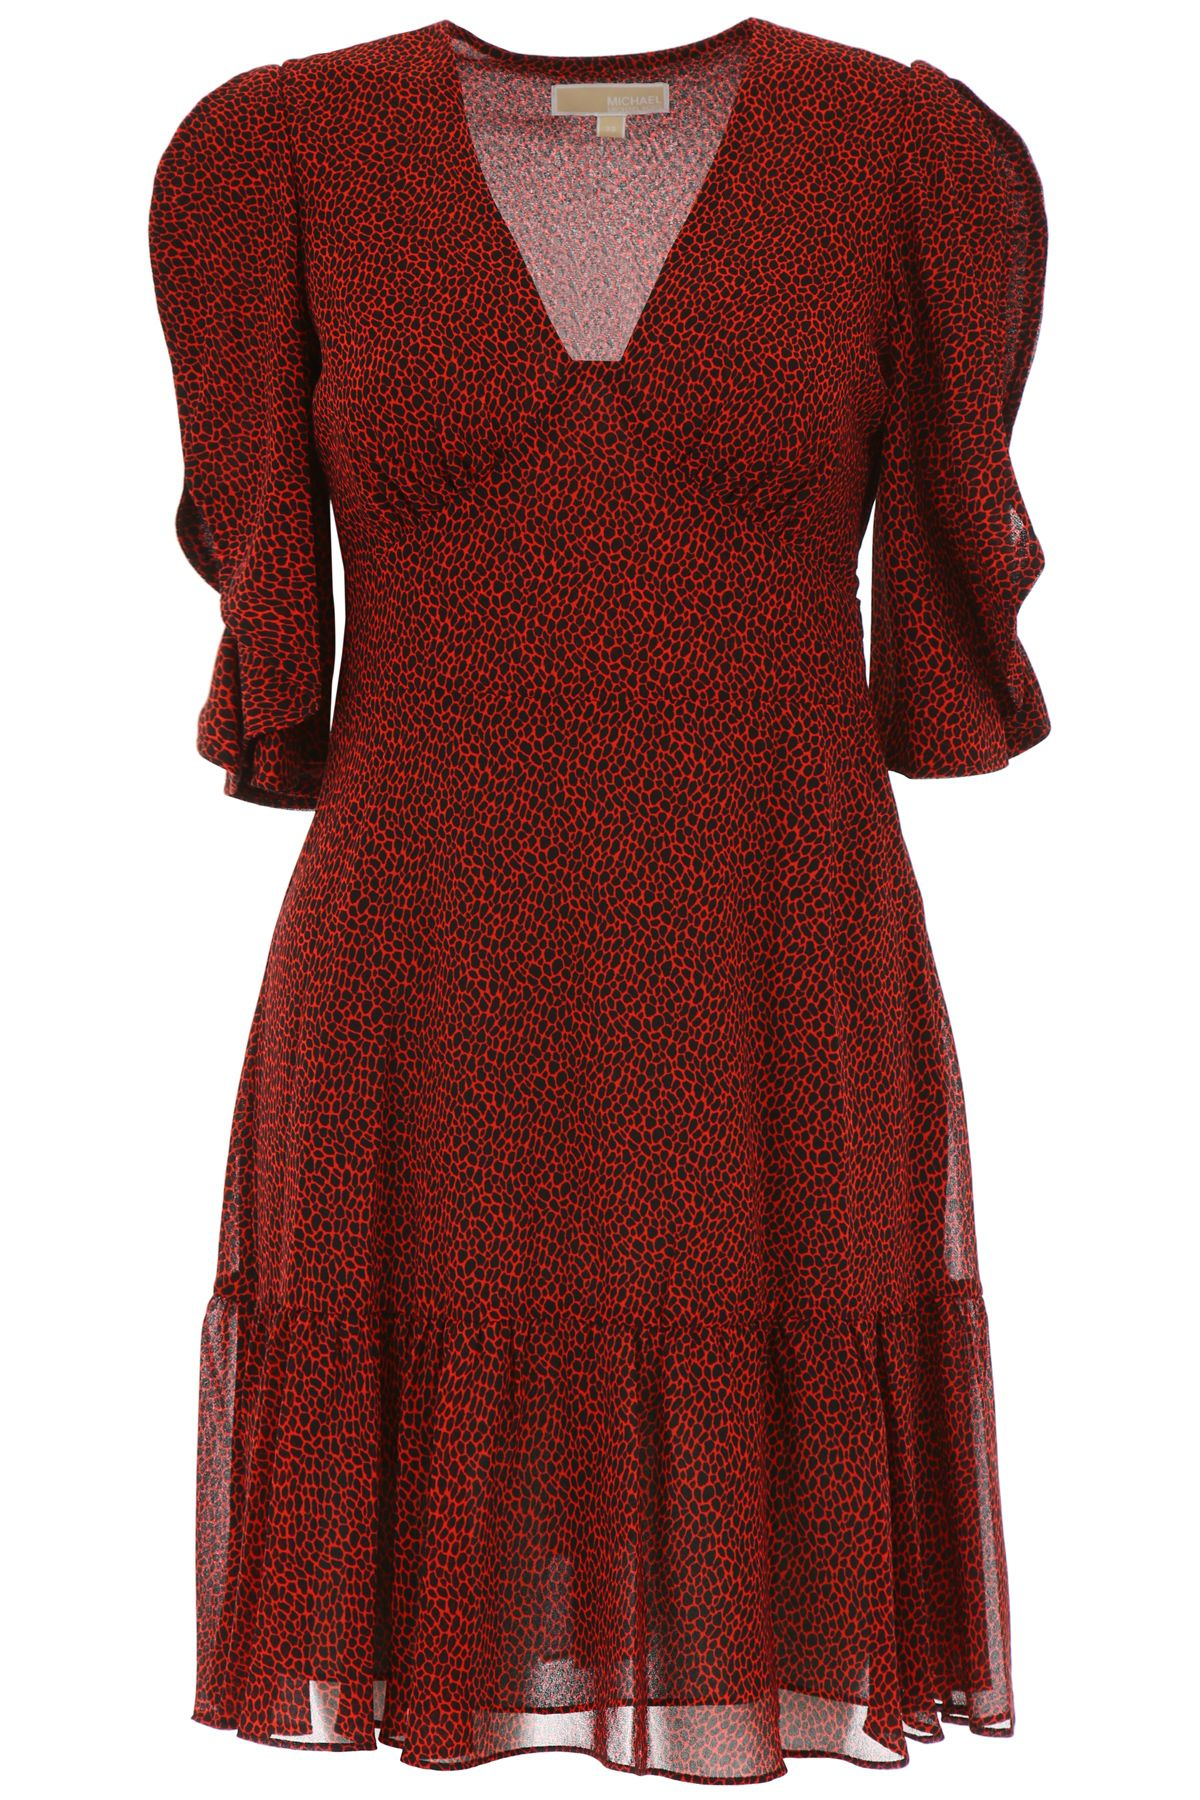 MICHAEL Michael Kors Animal Print Dress